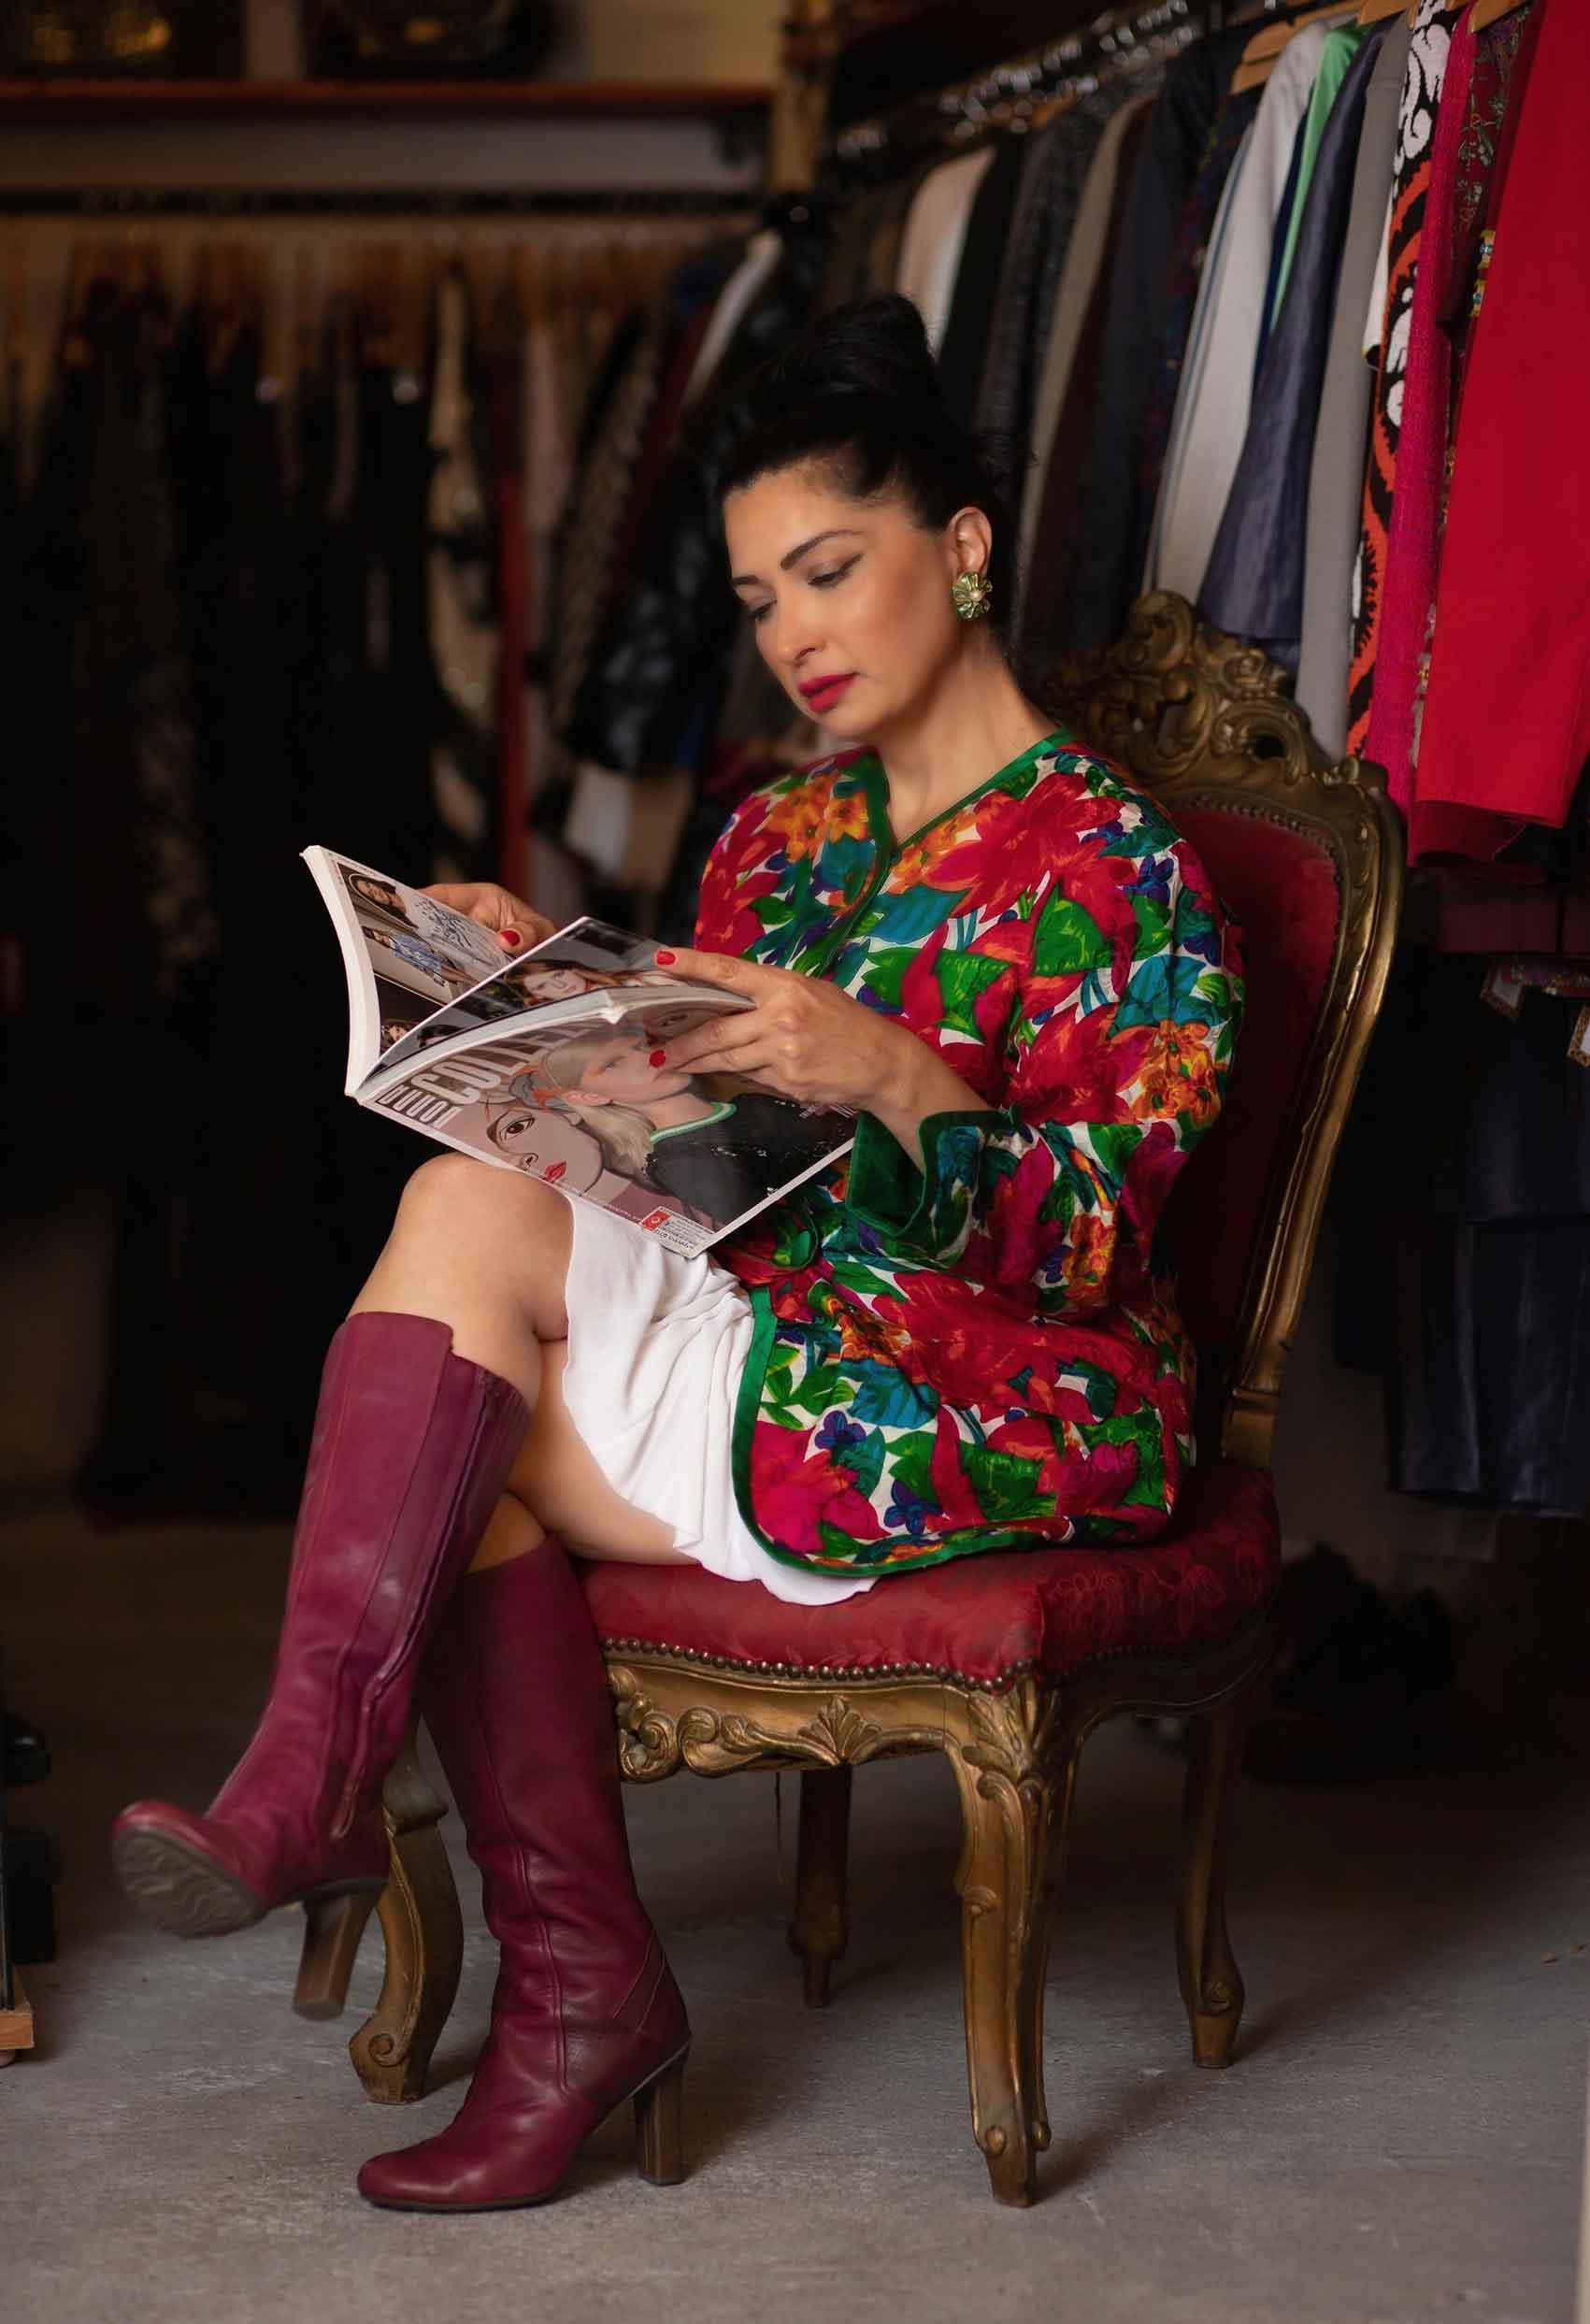 LOVE-ME-TWO-TIMES-מגזין-אופנה